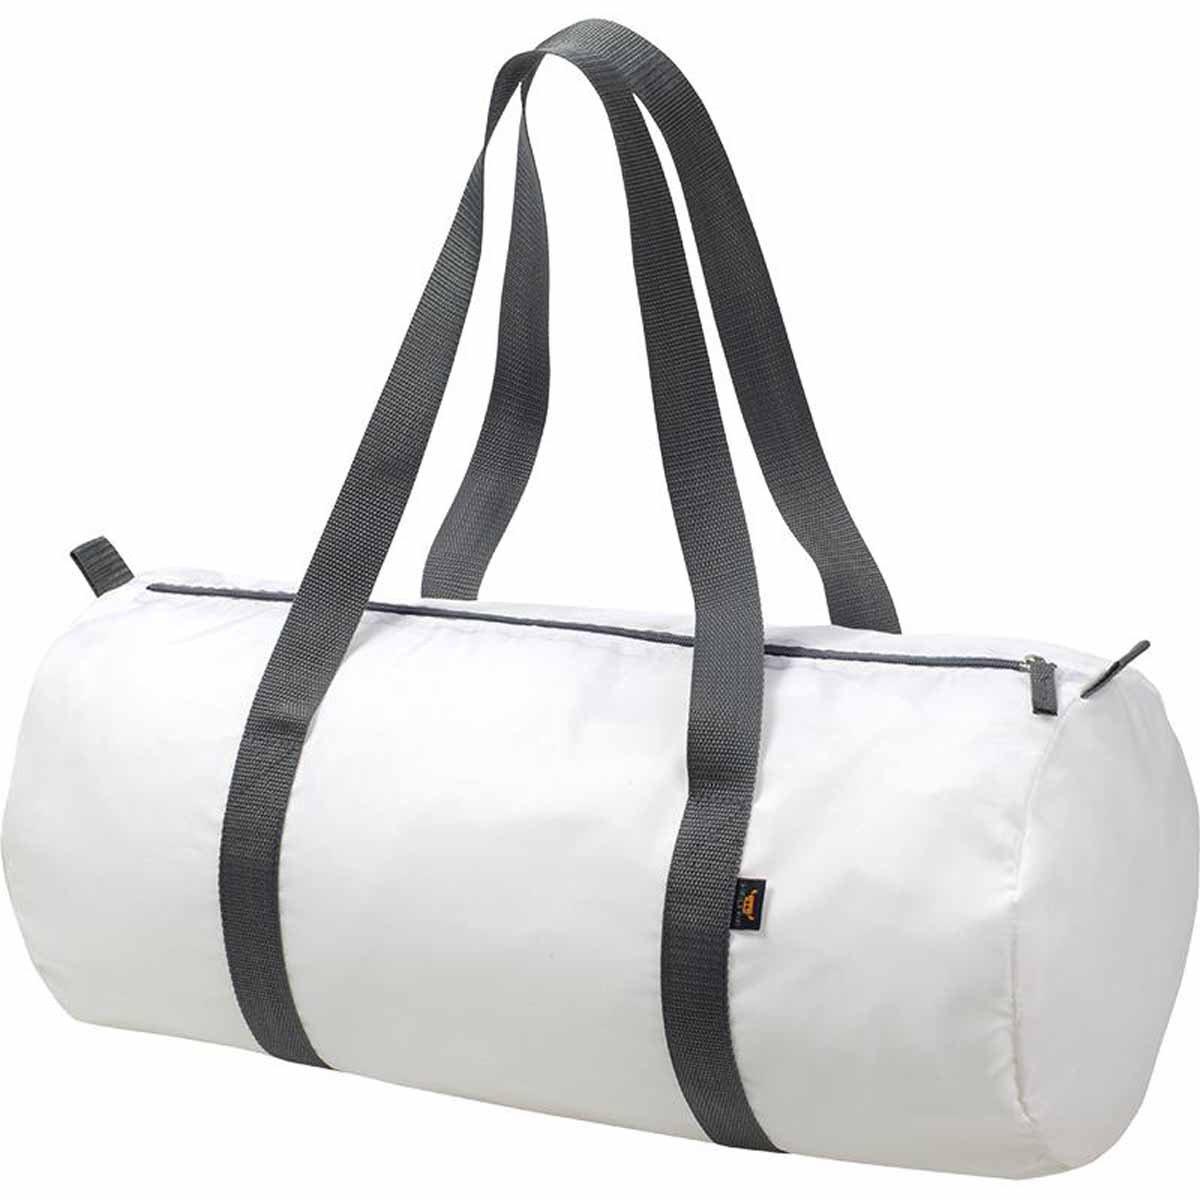 HALFAR - sac de sport - sac de voyage - sac polochon - 1807544 - mixte homme femme (Rose Fuschsia) oKSxcc0t